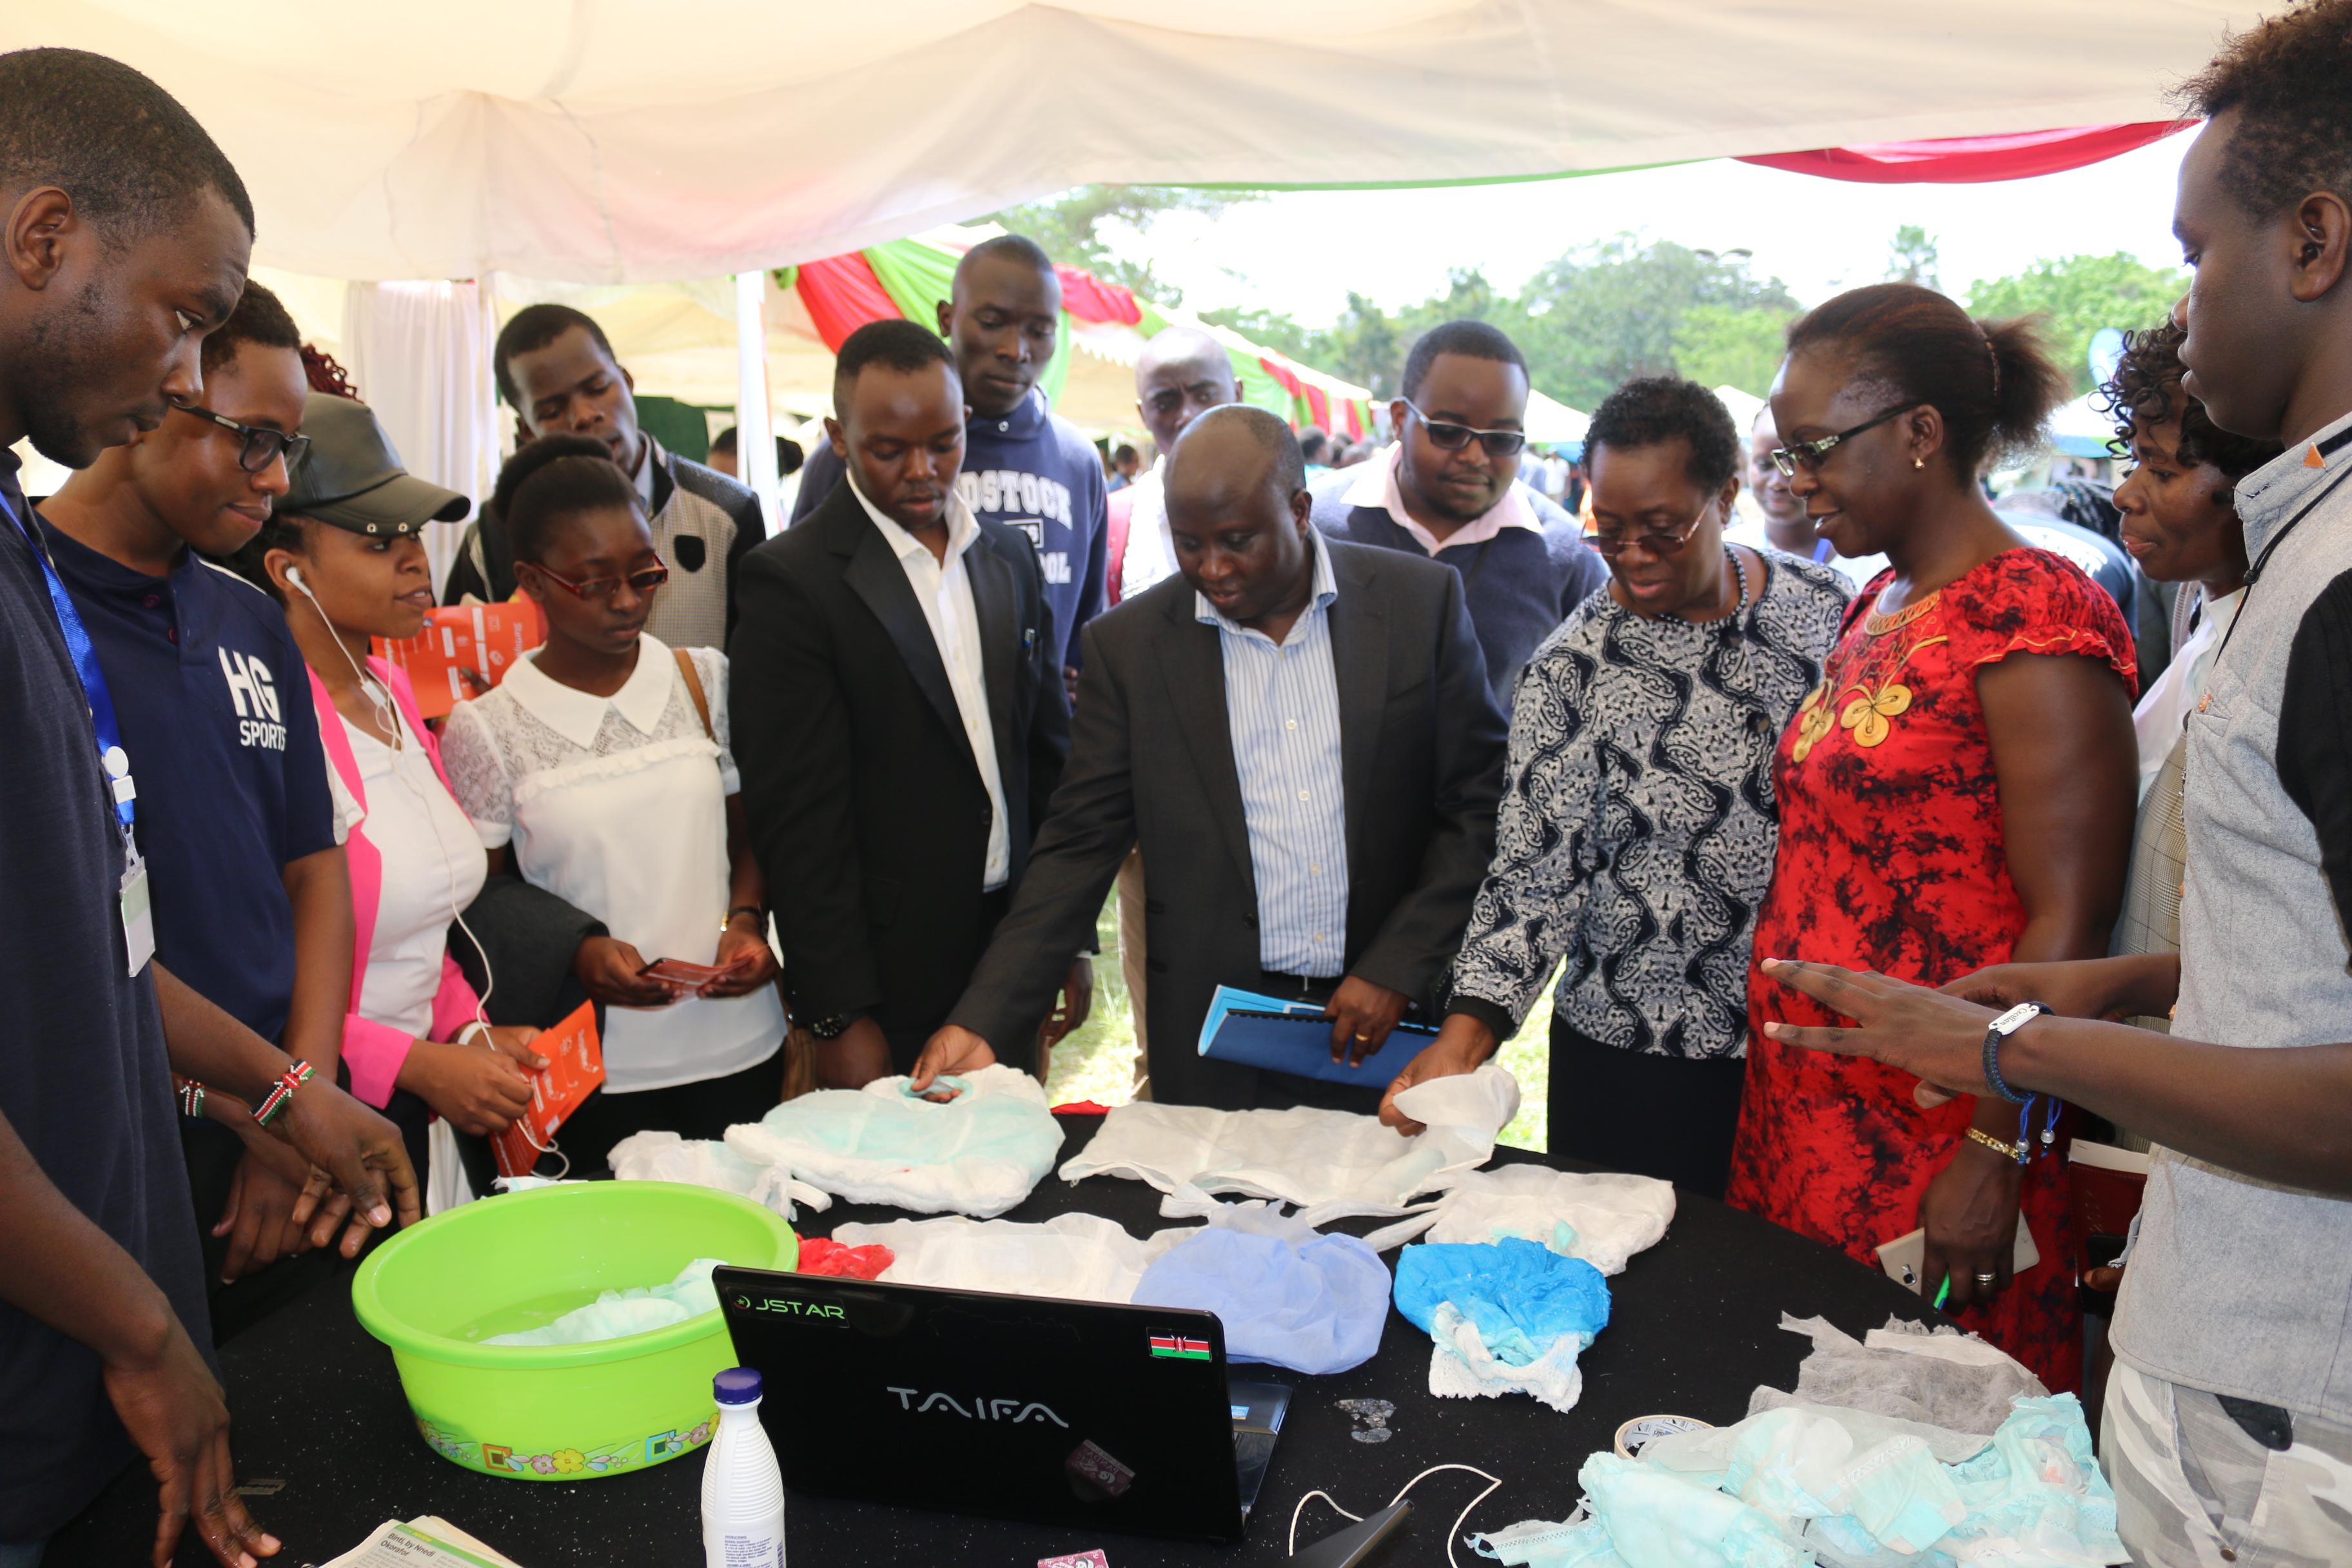 Top University management led by Council member Eng. John Tanui and VC Prof. Mabel Imbuga marvel at the 'Begi bora' project at last year's Tech Expo